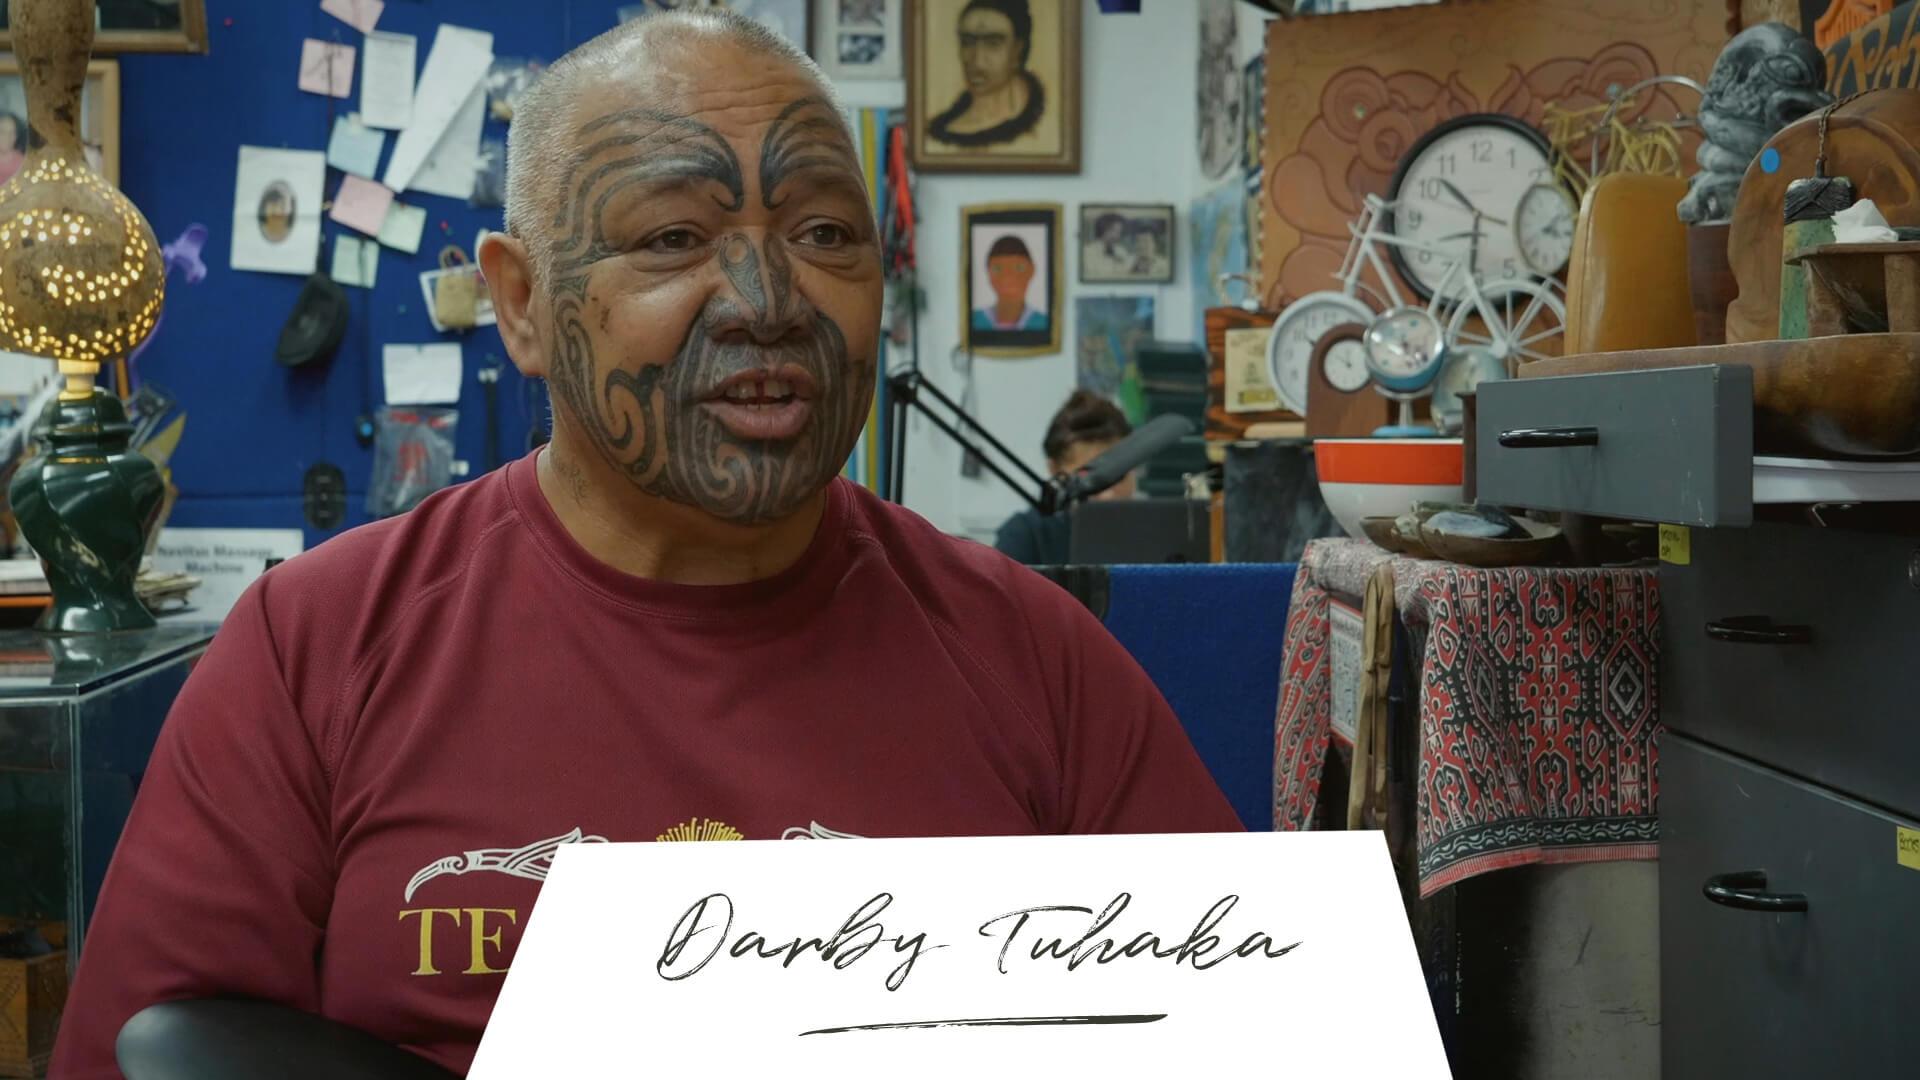 Where is now? Darby Tuhaka Wegbegleiter